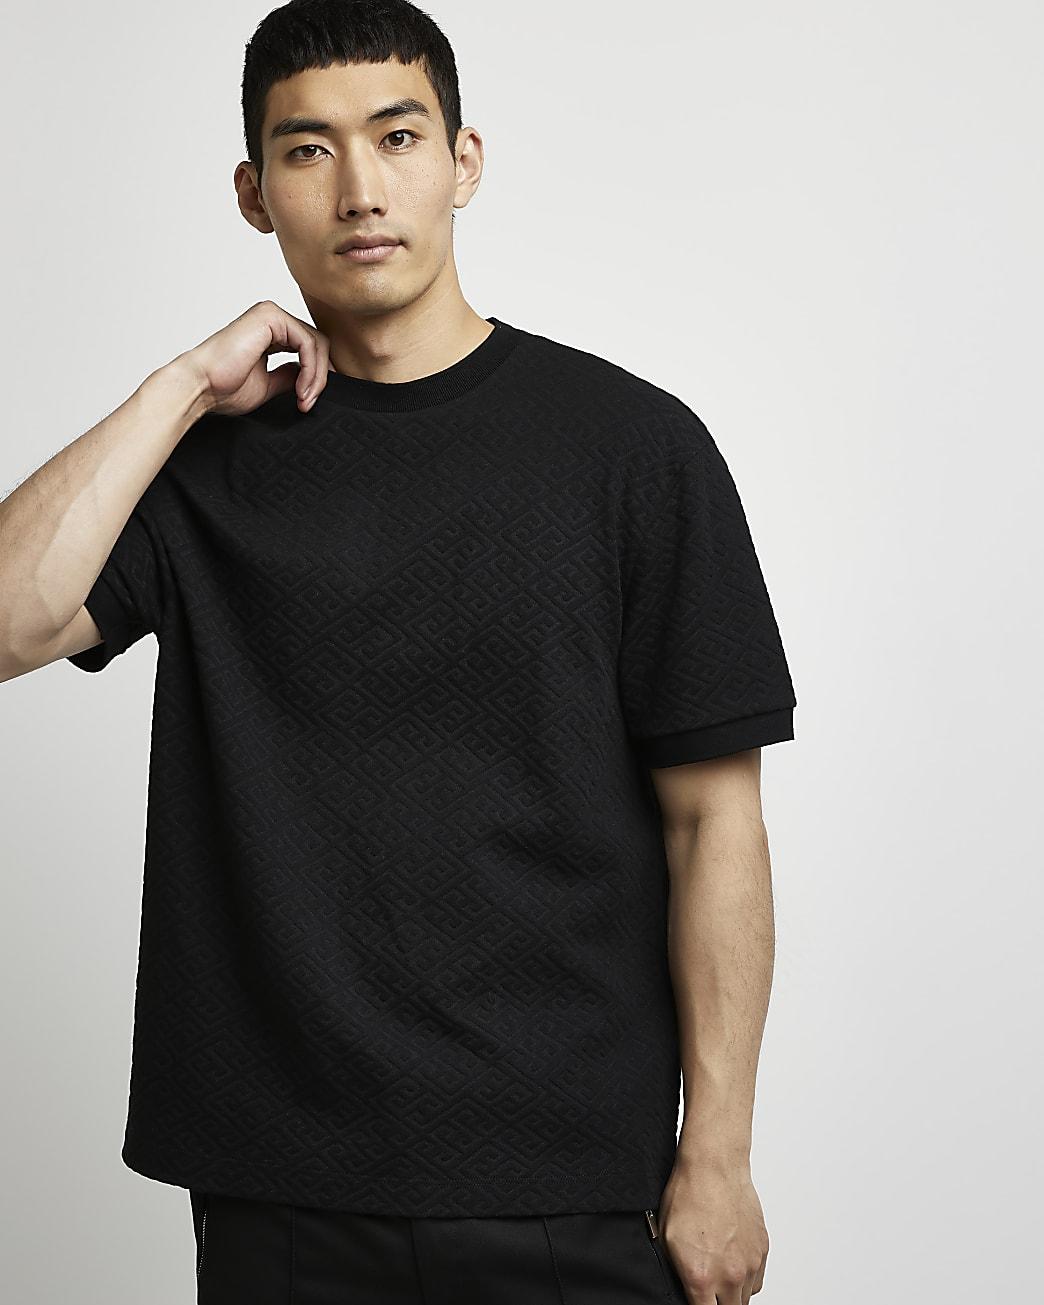 Black cotton jacquard slim fit t-shirt